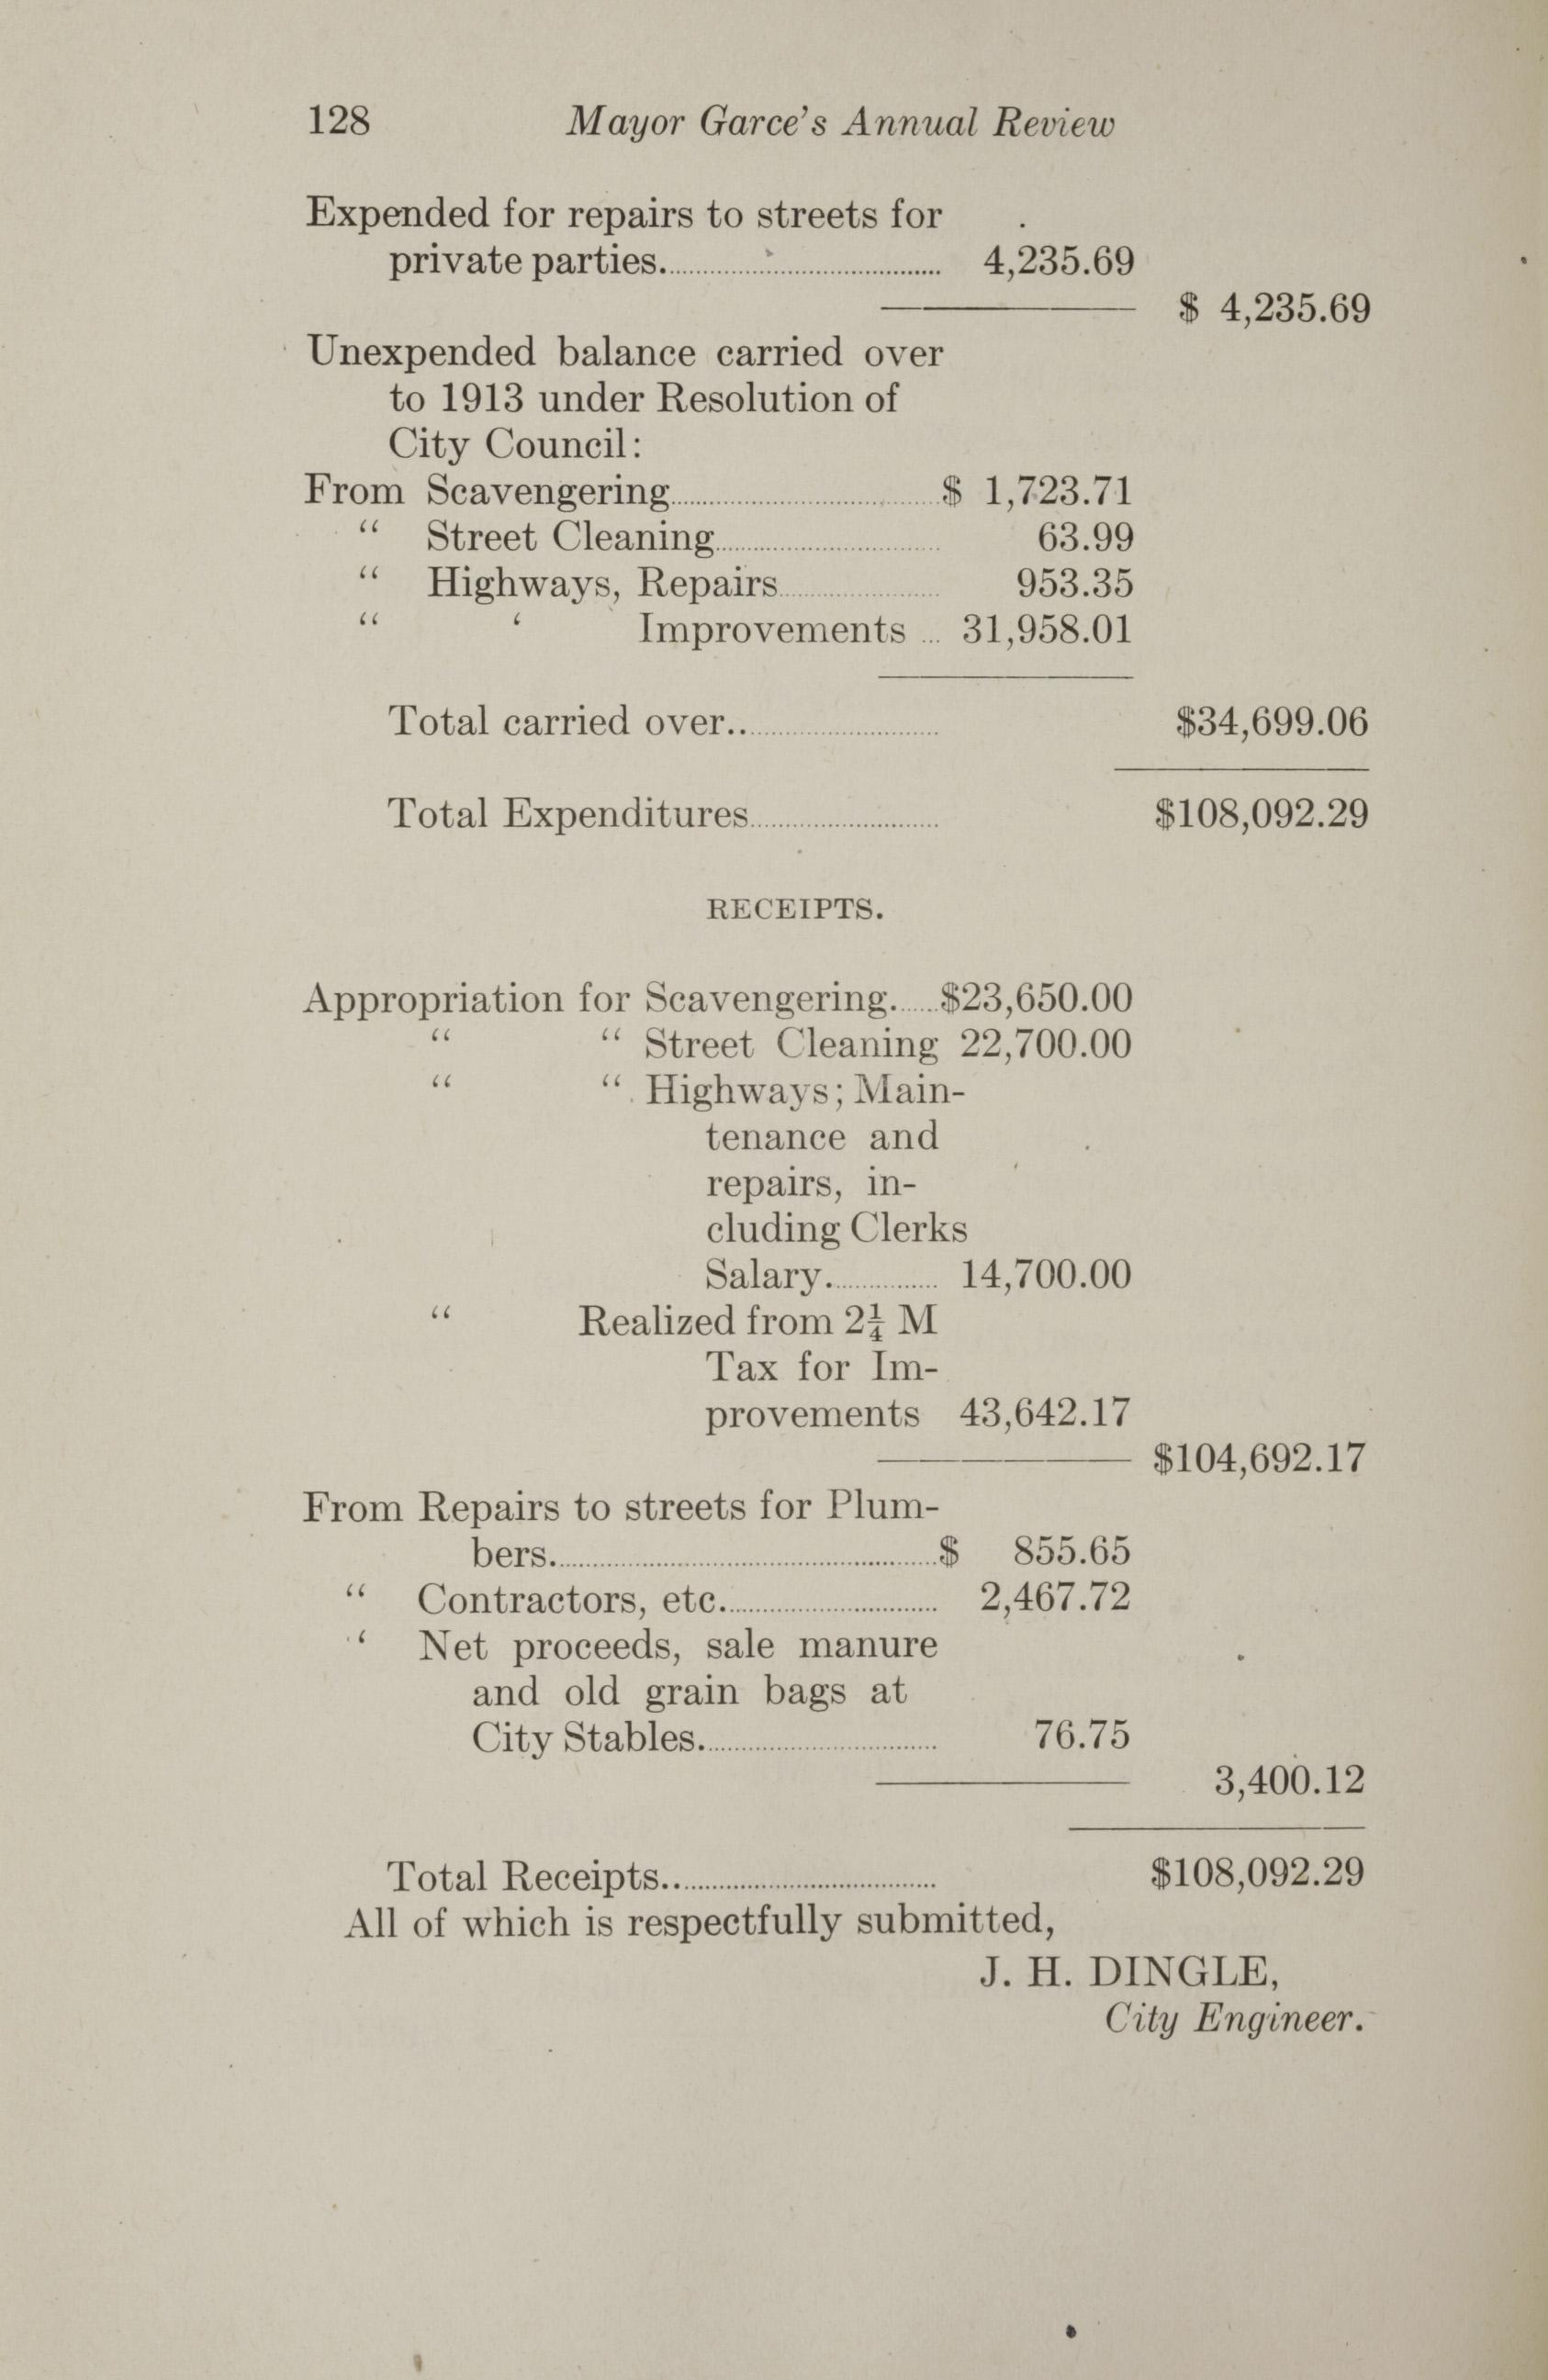 Charleston Yearbook, 1912, page 128